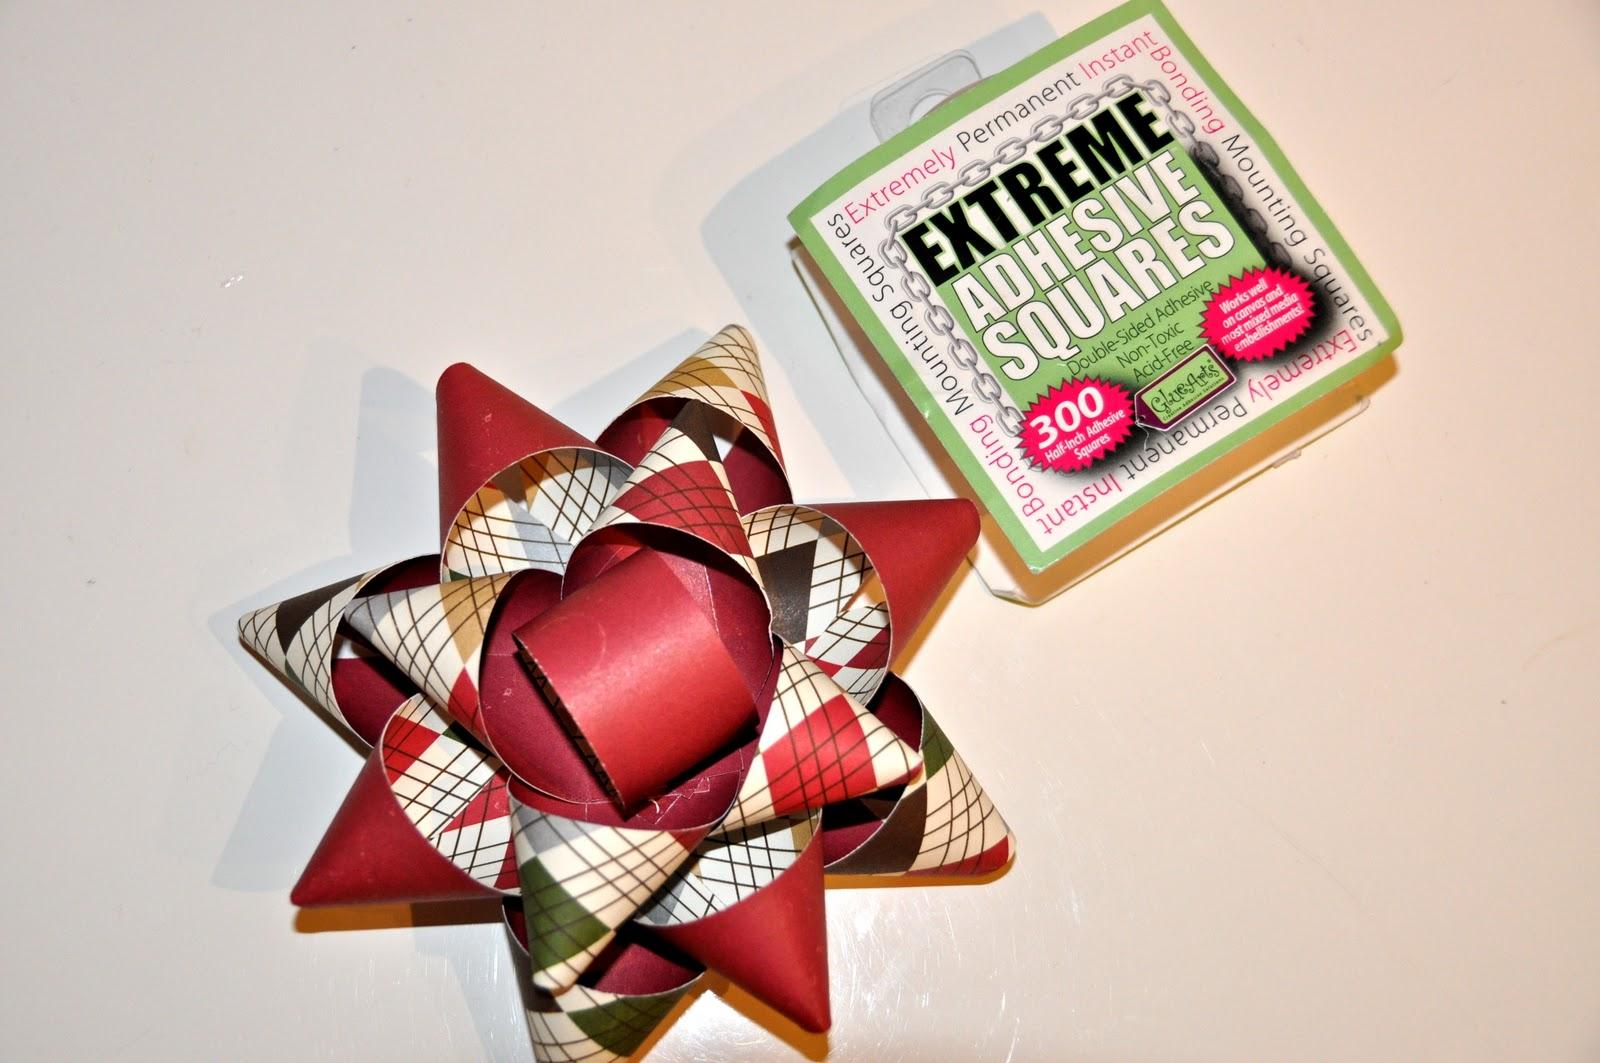 courts crafts diy christmas bows matching tag an card too - Diy Christmas Bows